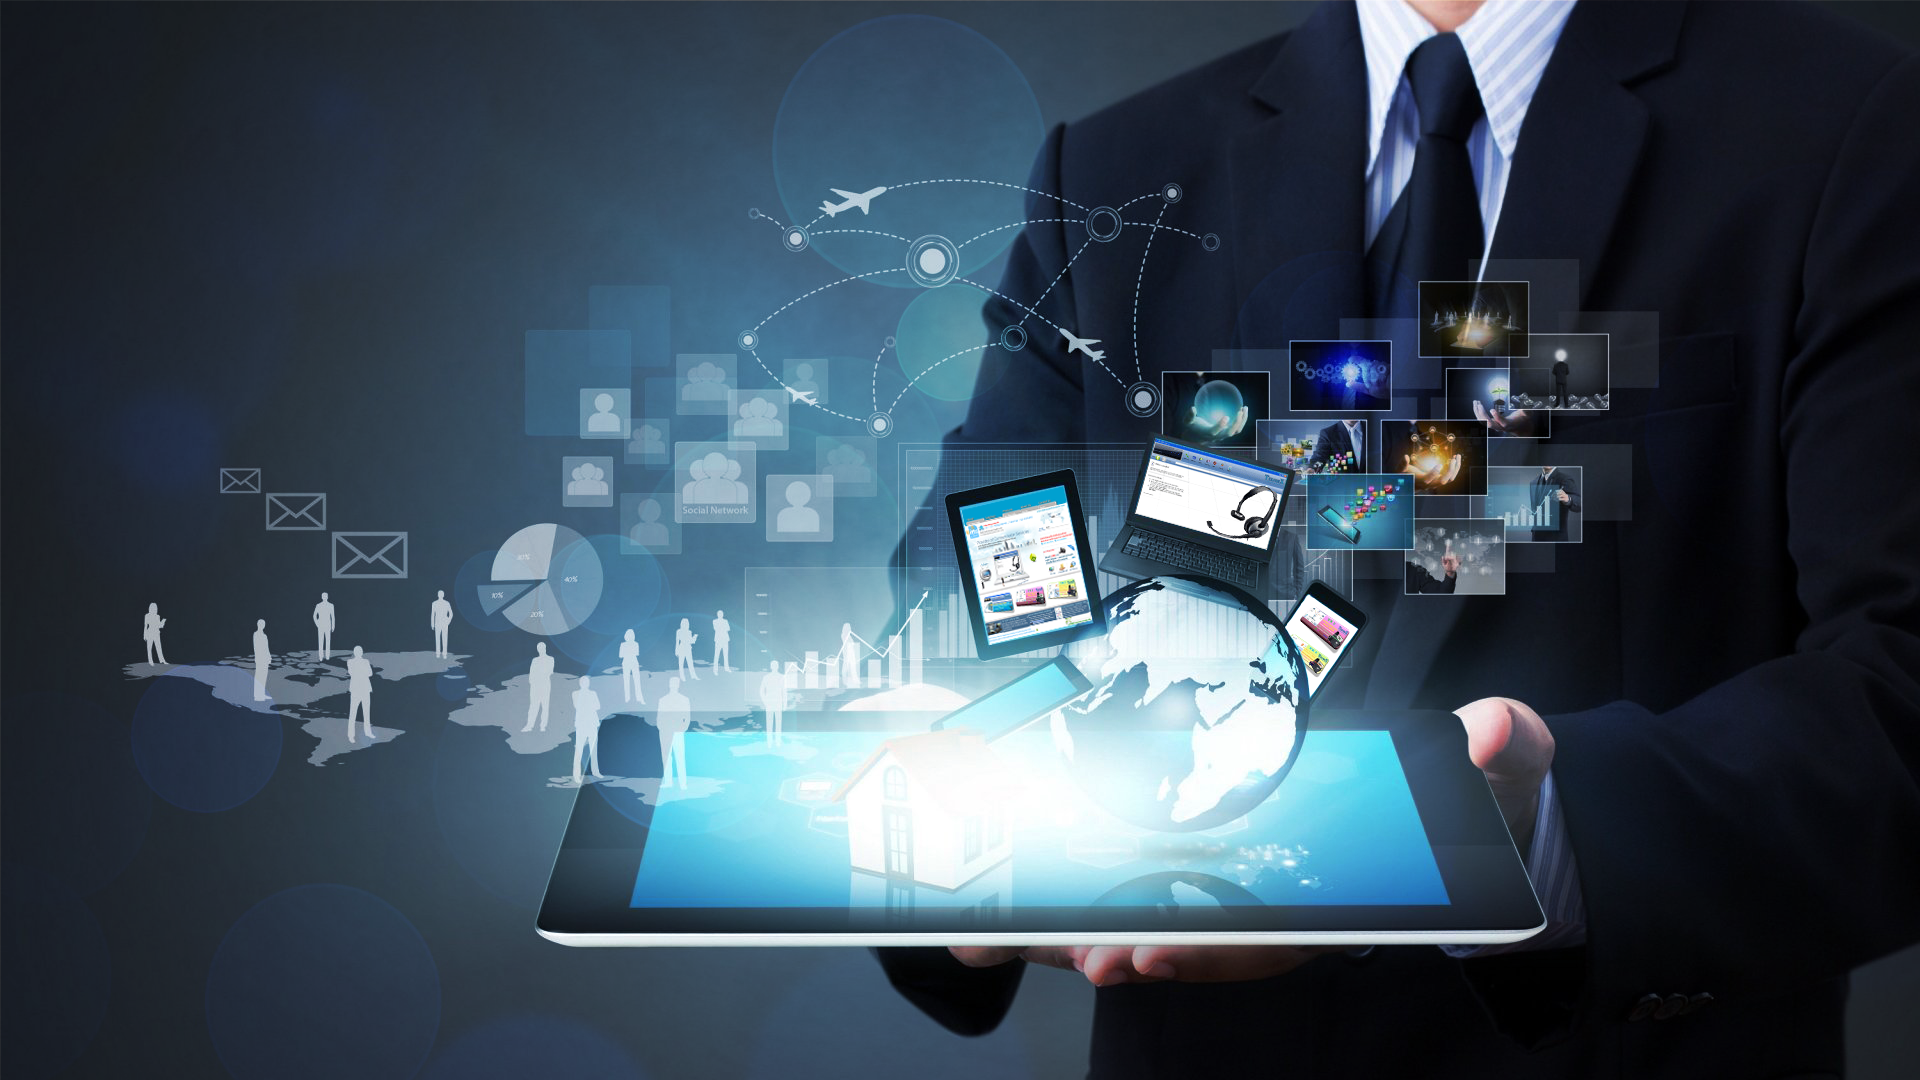 CallCenter,ติดตั้ง CallCenter, ติดตั้ง Tele sale, ระบบตอบรับ IVR, ระบบตอบรับอัตโนมัติ, Tele sale, IVR, WEB APP, CRM, SMS, IP-PBX, VOIP,  CTI ,Call Center, Cloud Call Center,คอลเซ็นเตอร์,คลาวด์คอลเซ็นเตอร์, Cloud IVR, Voice Broadcast, Smart Softphone